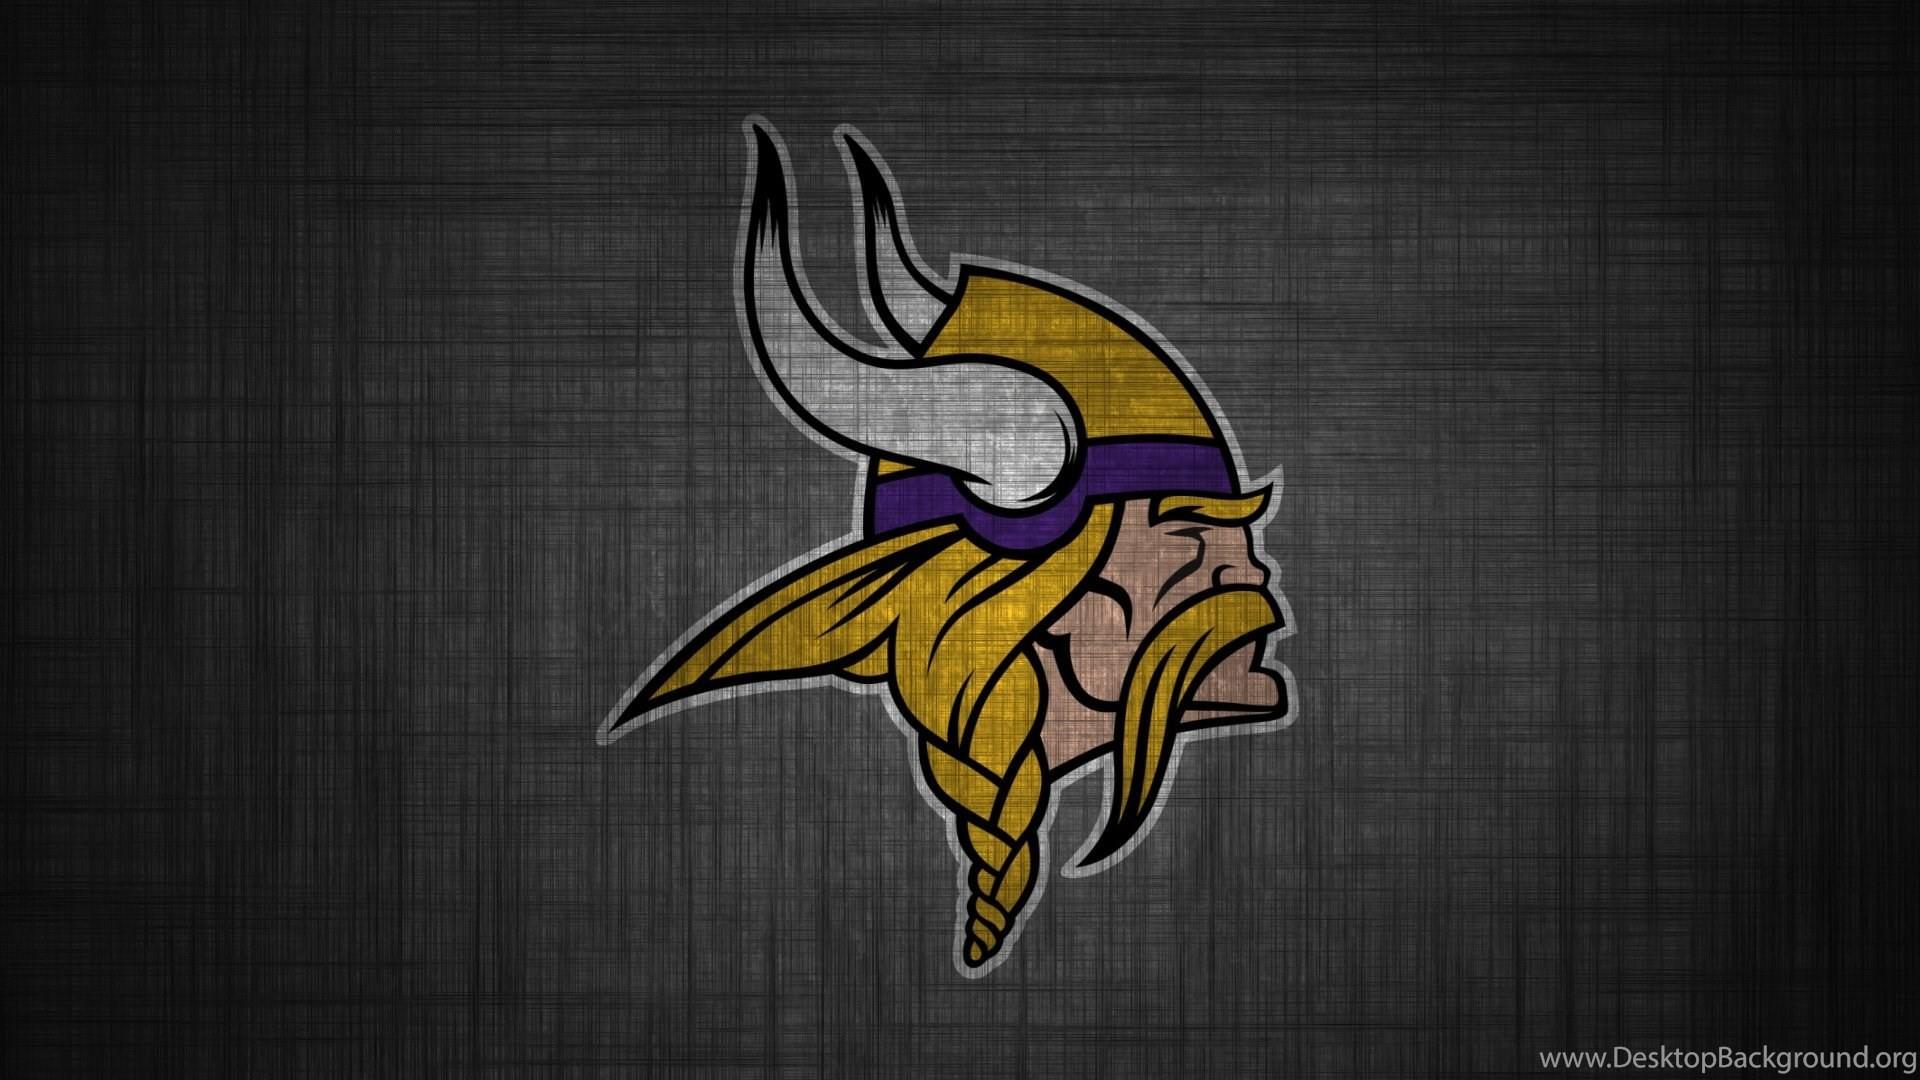 Res: 1920x1080, cool minnesota vikings wallpapers Minnesota Vikings Logo Wallpapers Desktop  Background